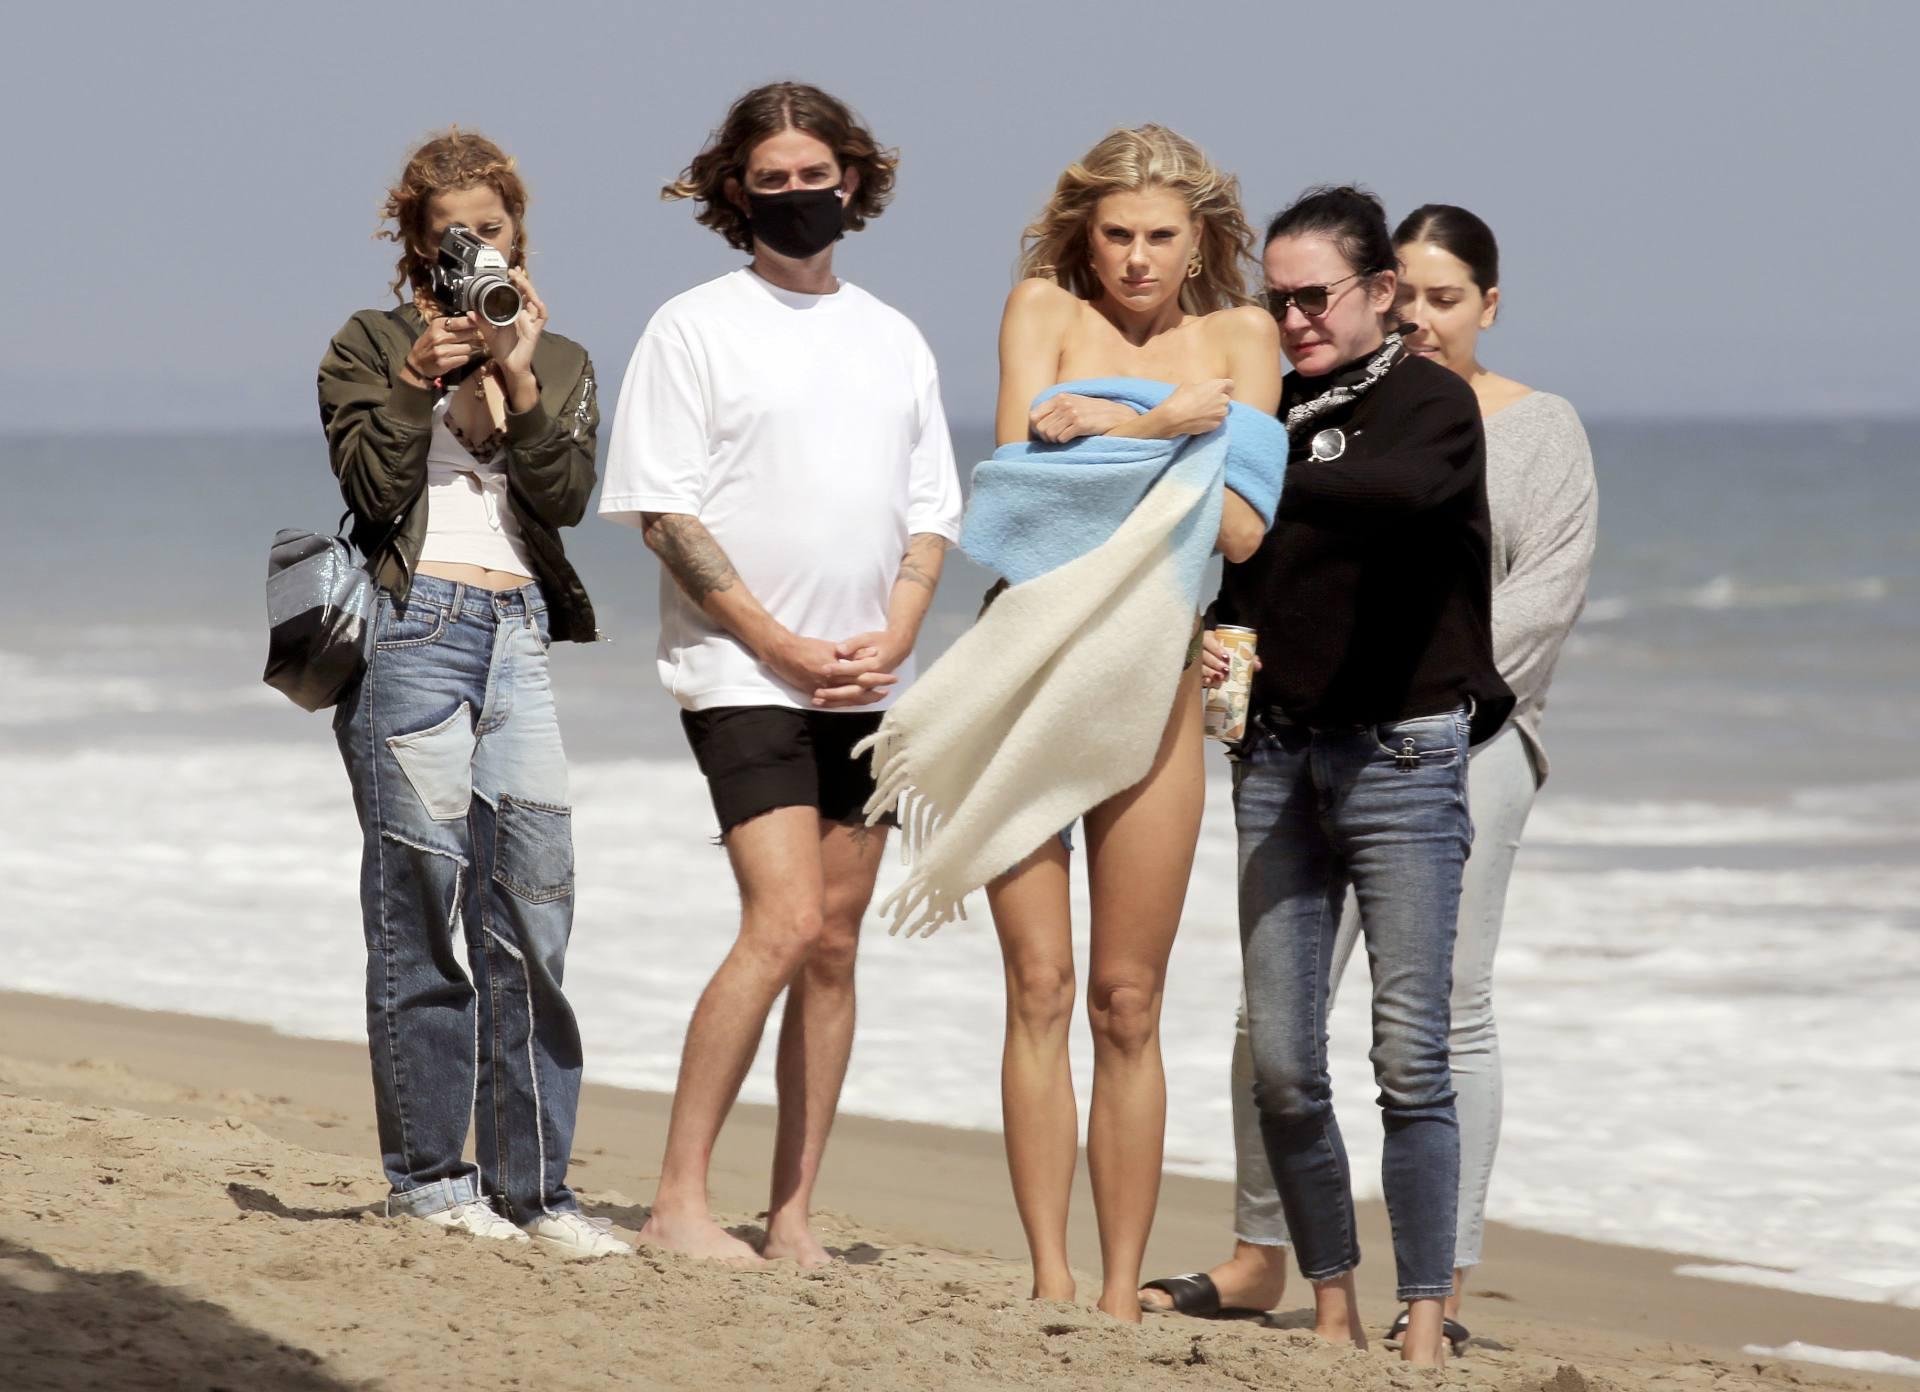 Charlotte Mckinney – Sexy Boobs In Tiny Bikini On The Beach In Los Angeles 0003